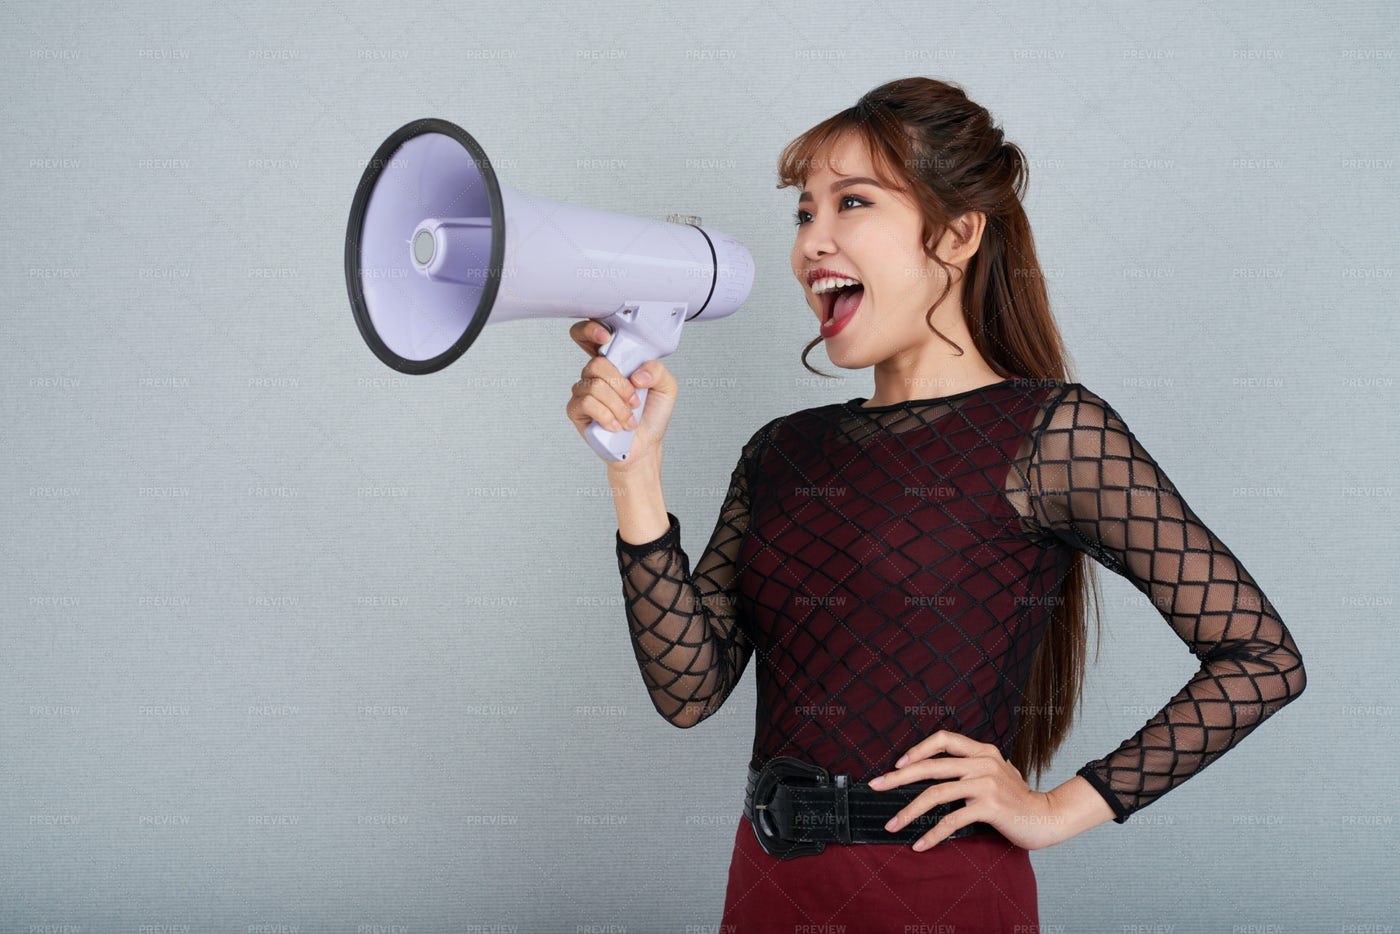 Shouting Into Megaphone: Stock Photos